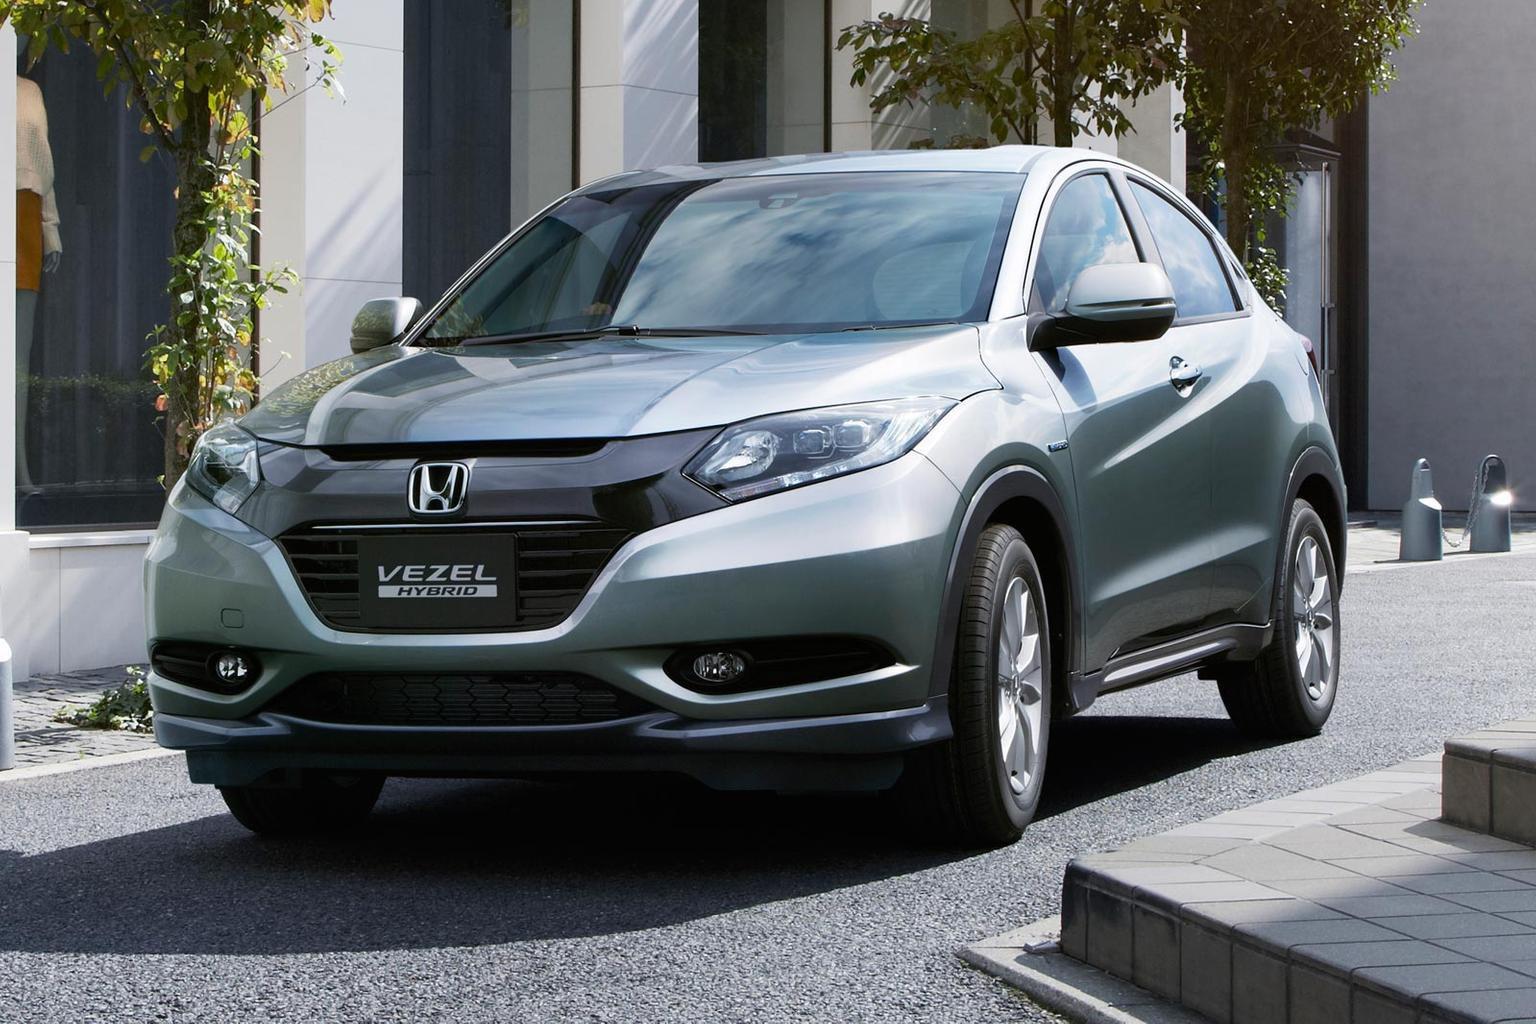 Honda launches Juke rival in Tokyo